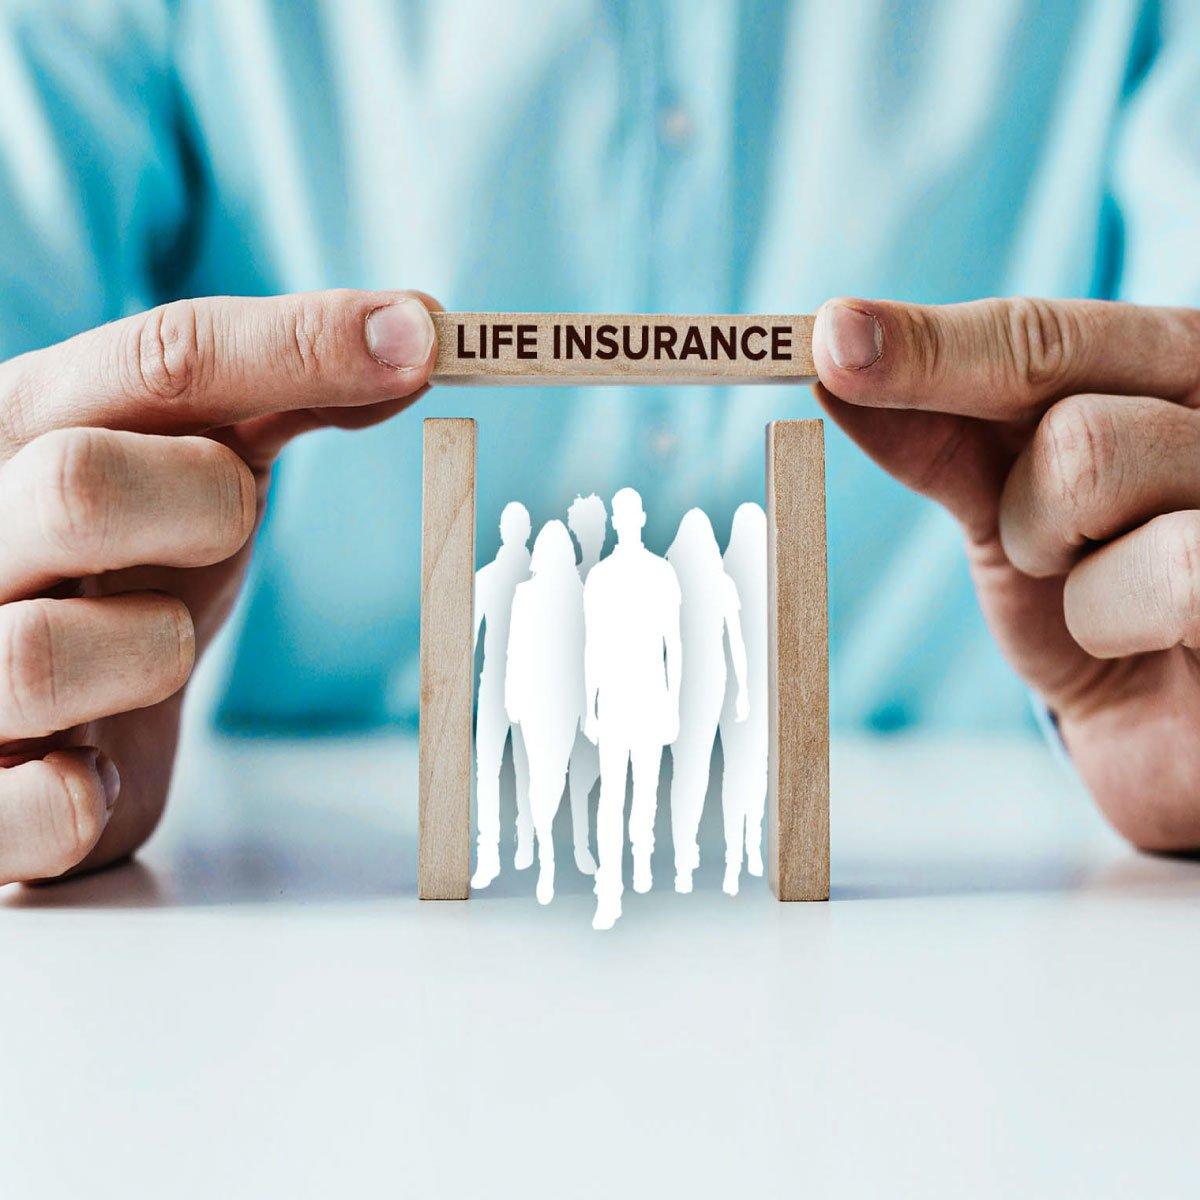 Online Life Insurance Sytem